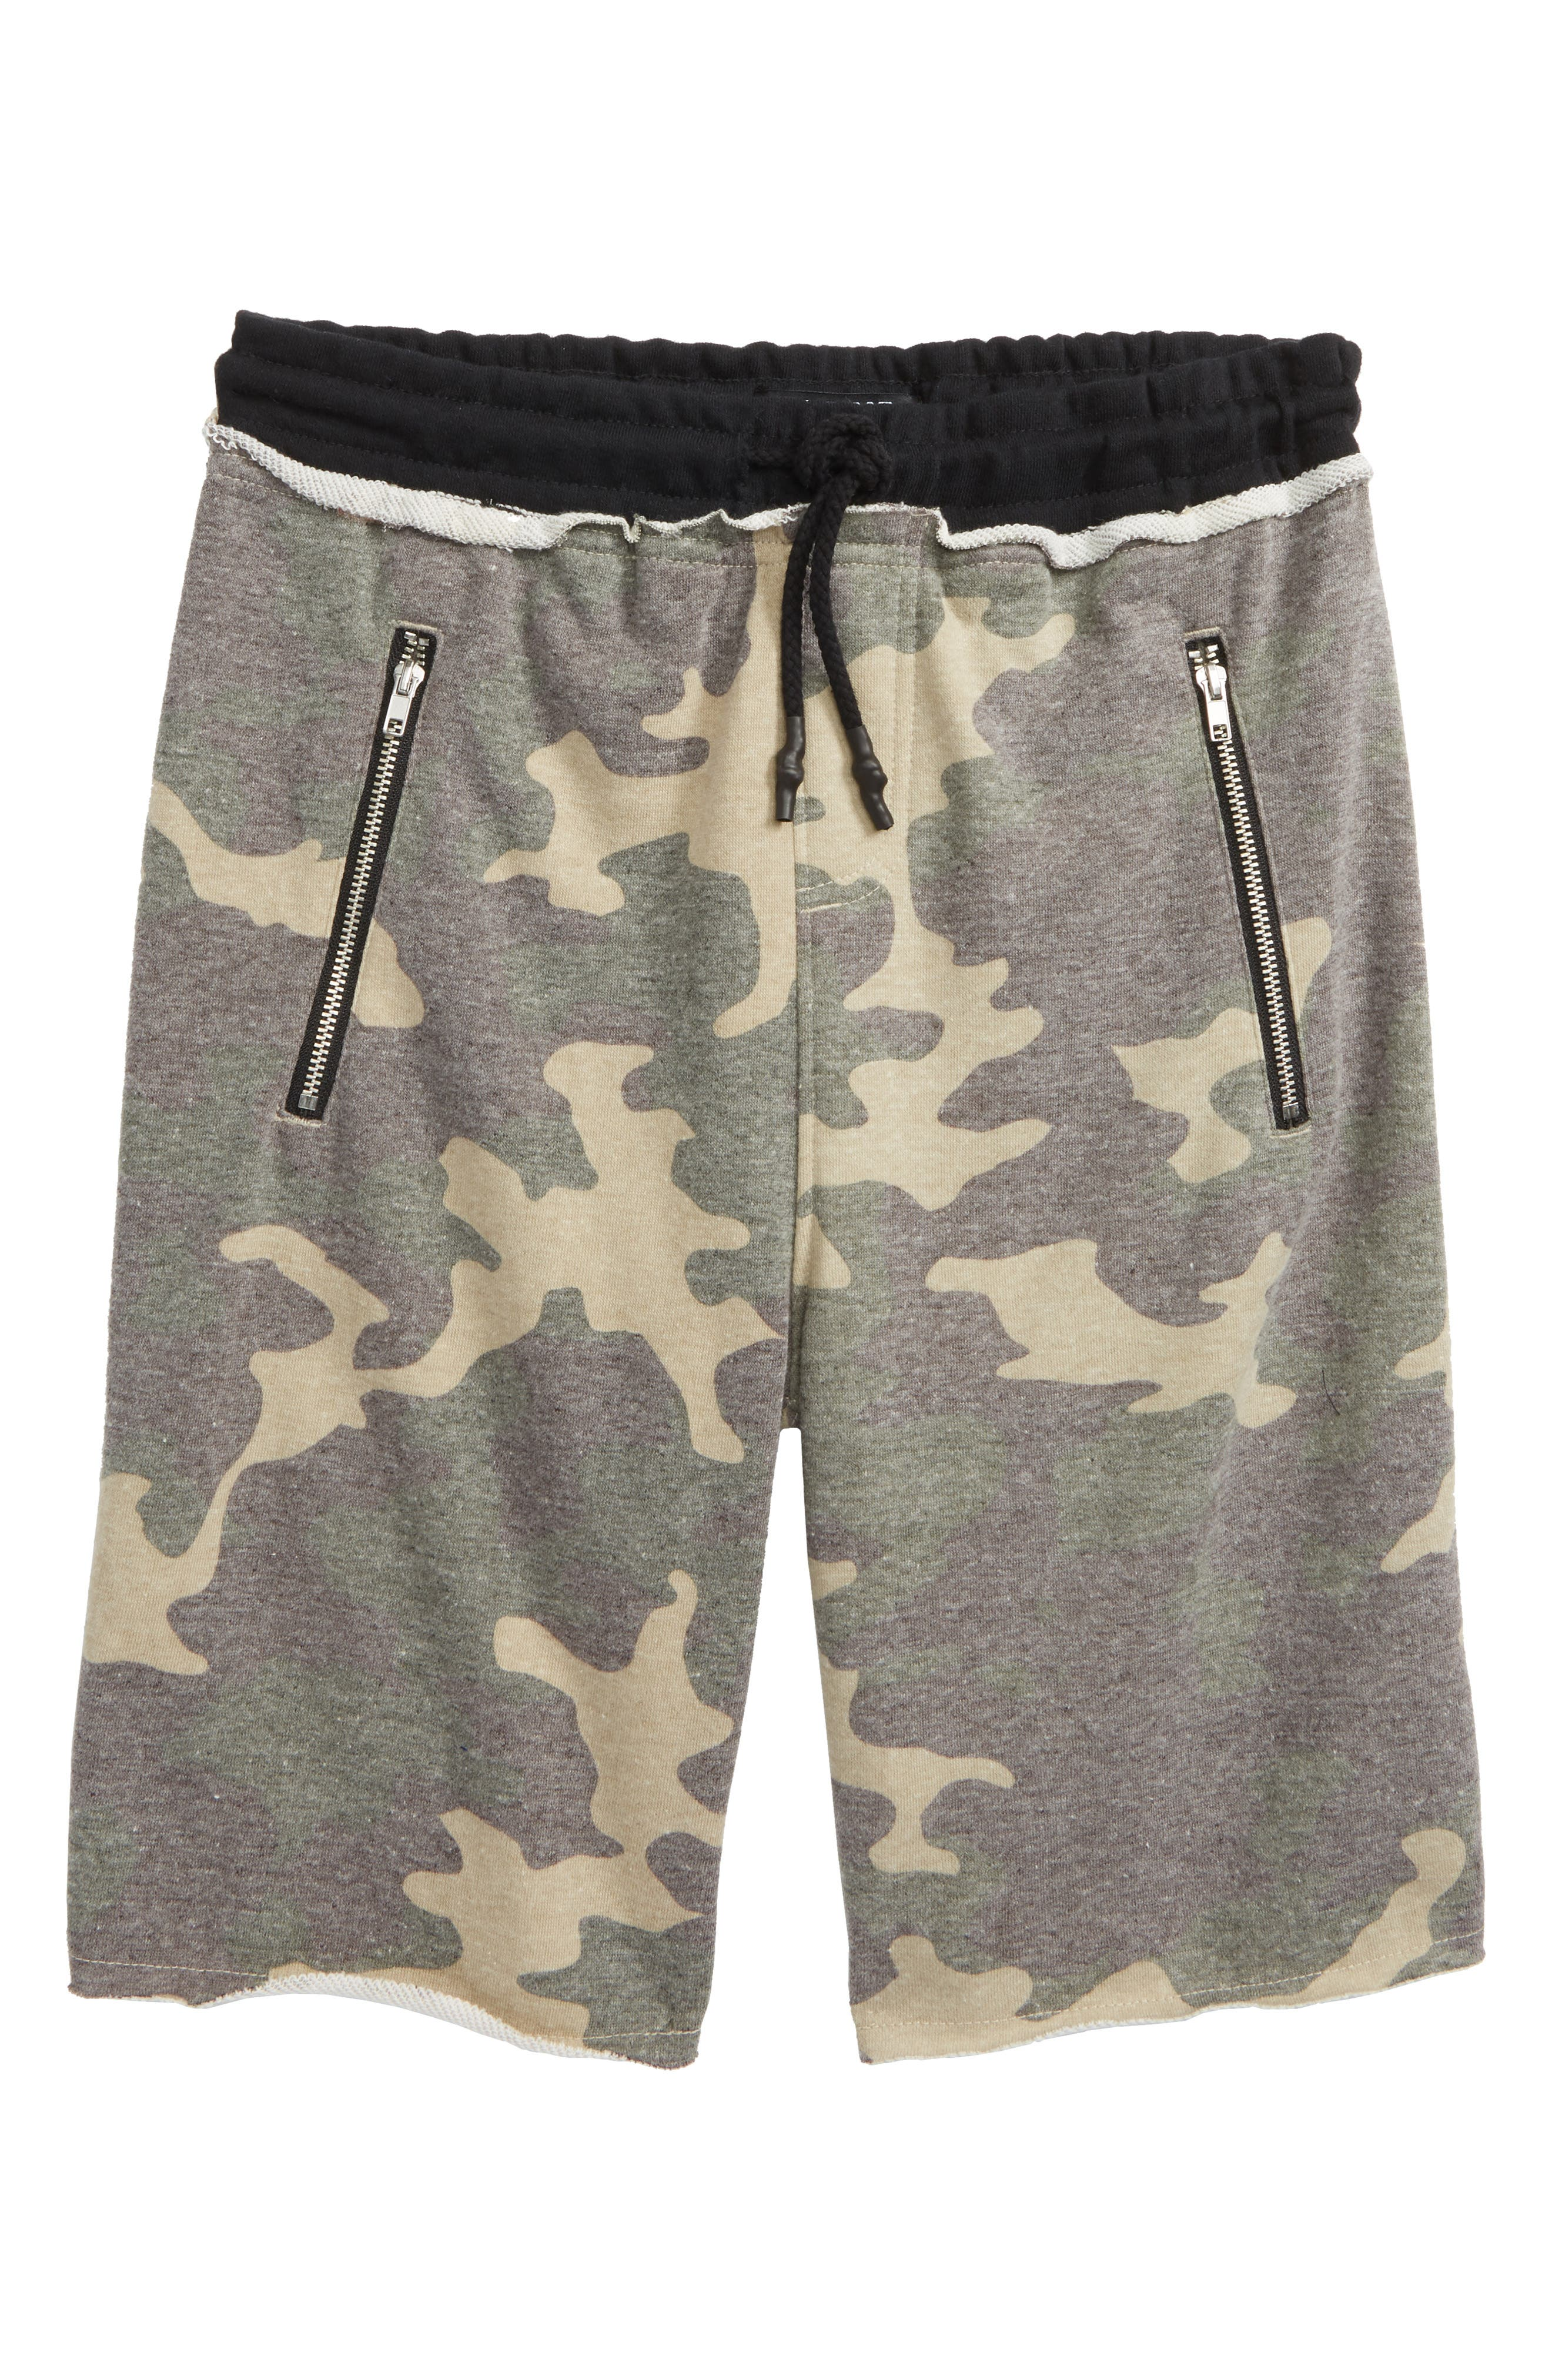 Raw Edge Shorts,                             Main thumbnail 1, color,                             Camo/ Black